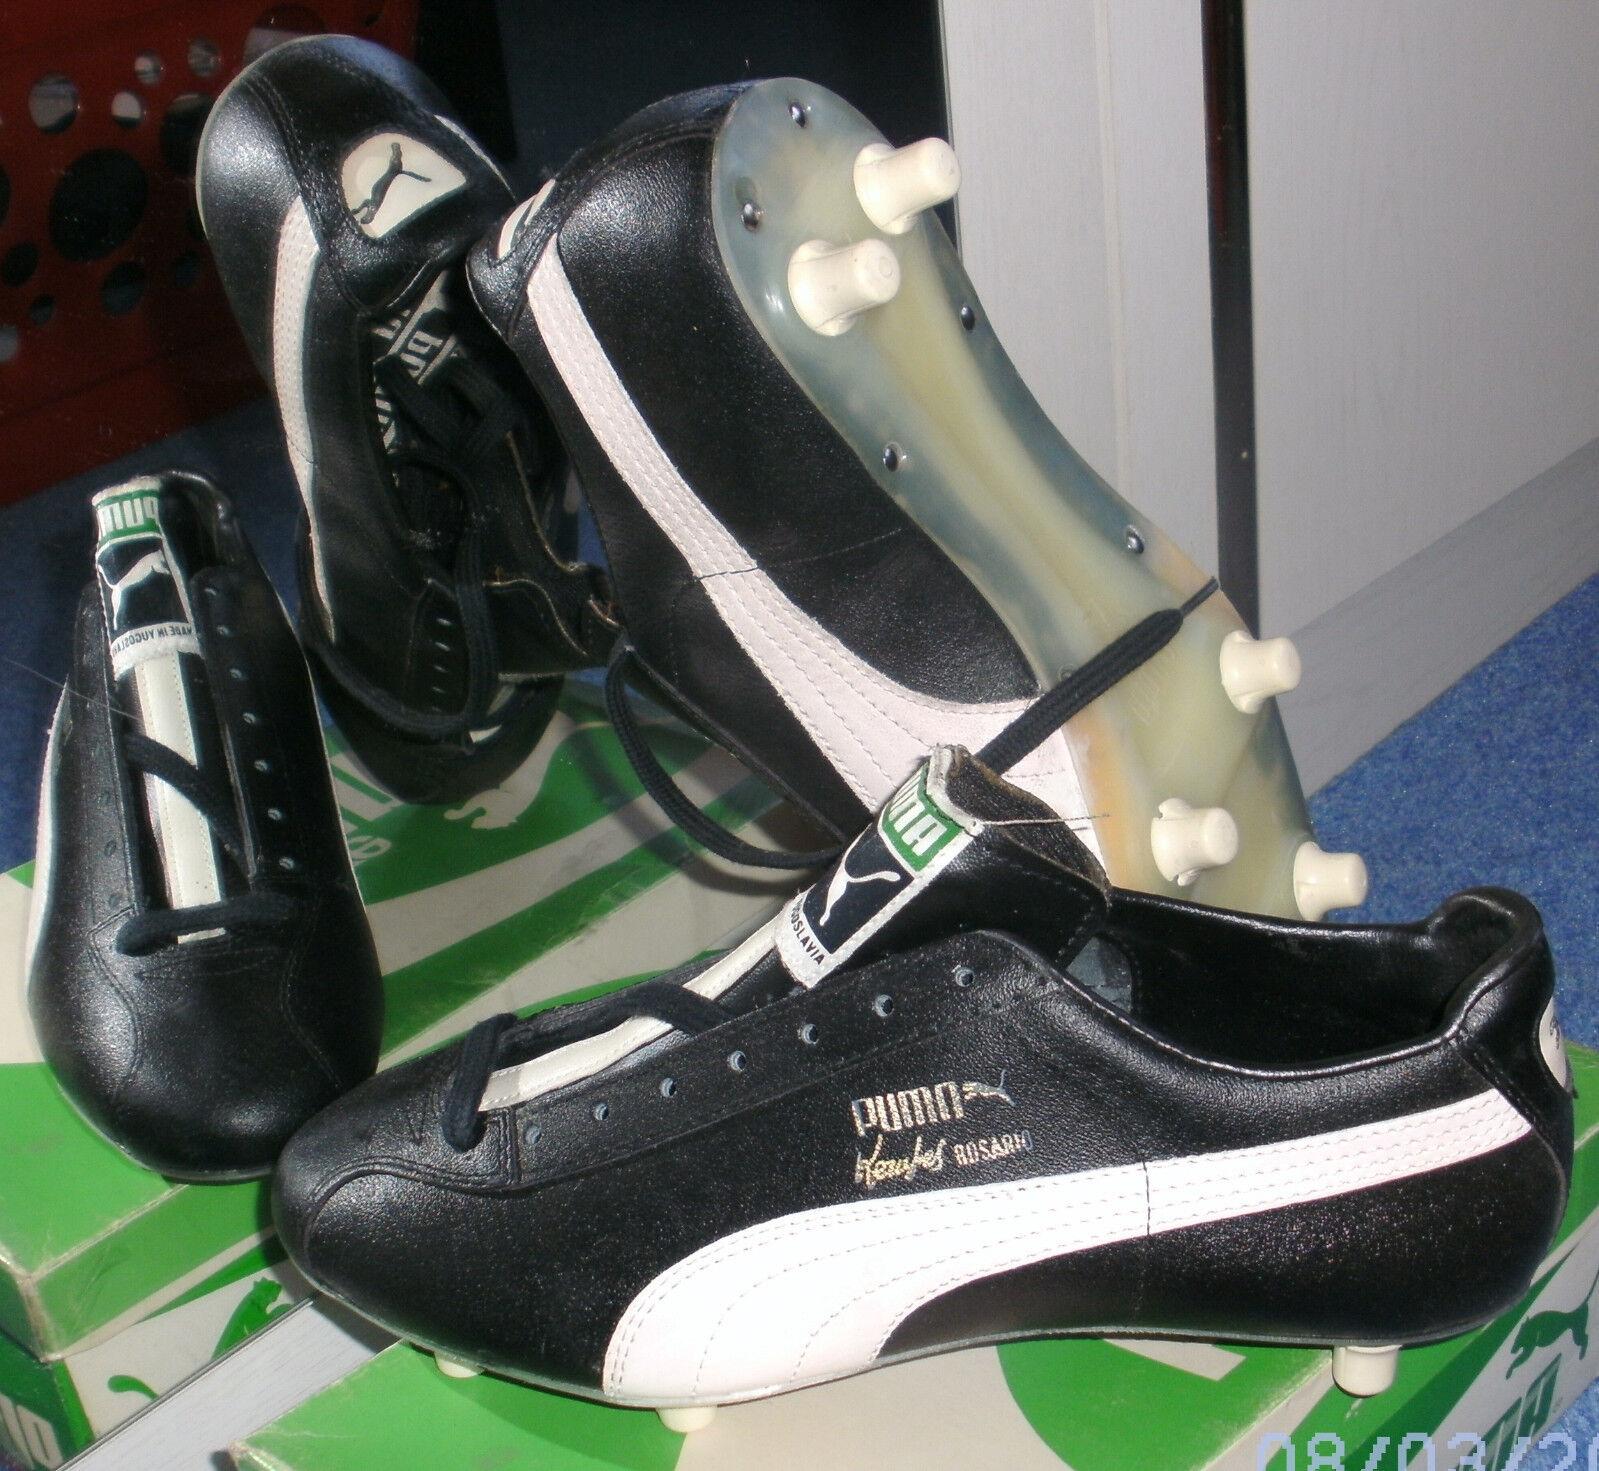 Neue seltene Vintage Puma Fußballschuhe Kempes Rosario SG 402, Gr. 41 = 7,5